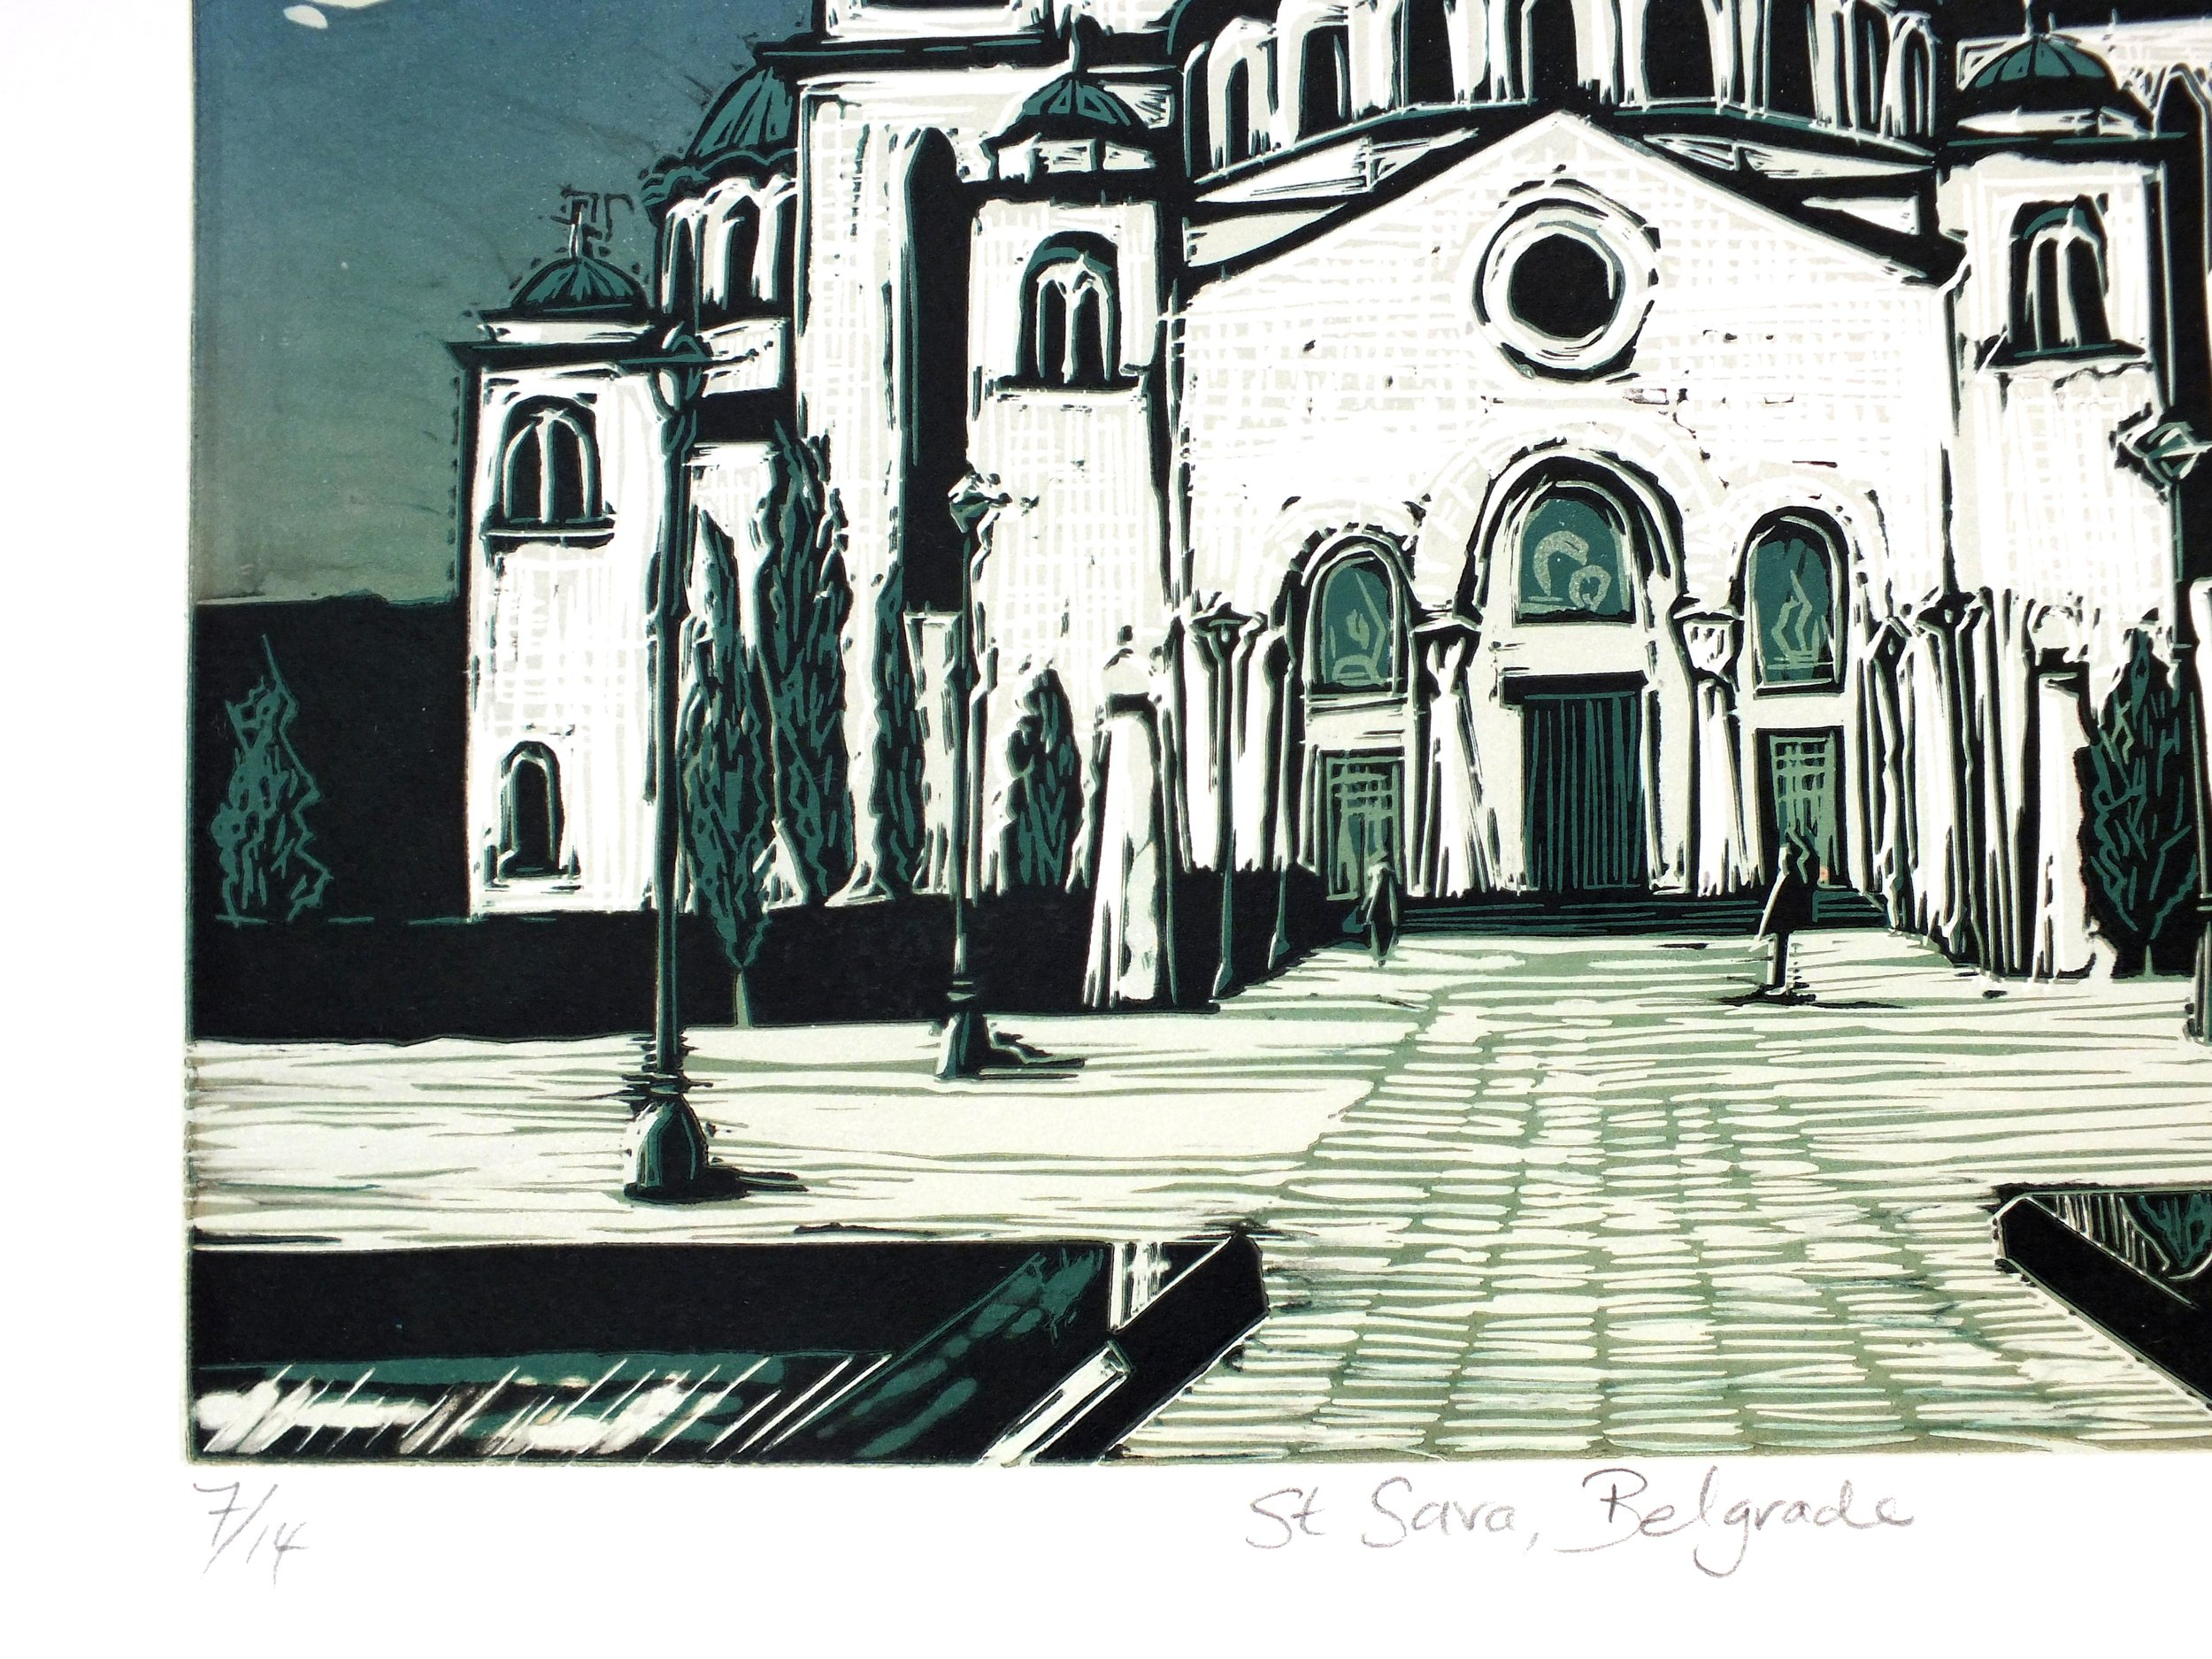 St Sava lino #7 closeup.jpg